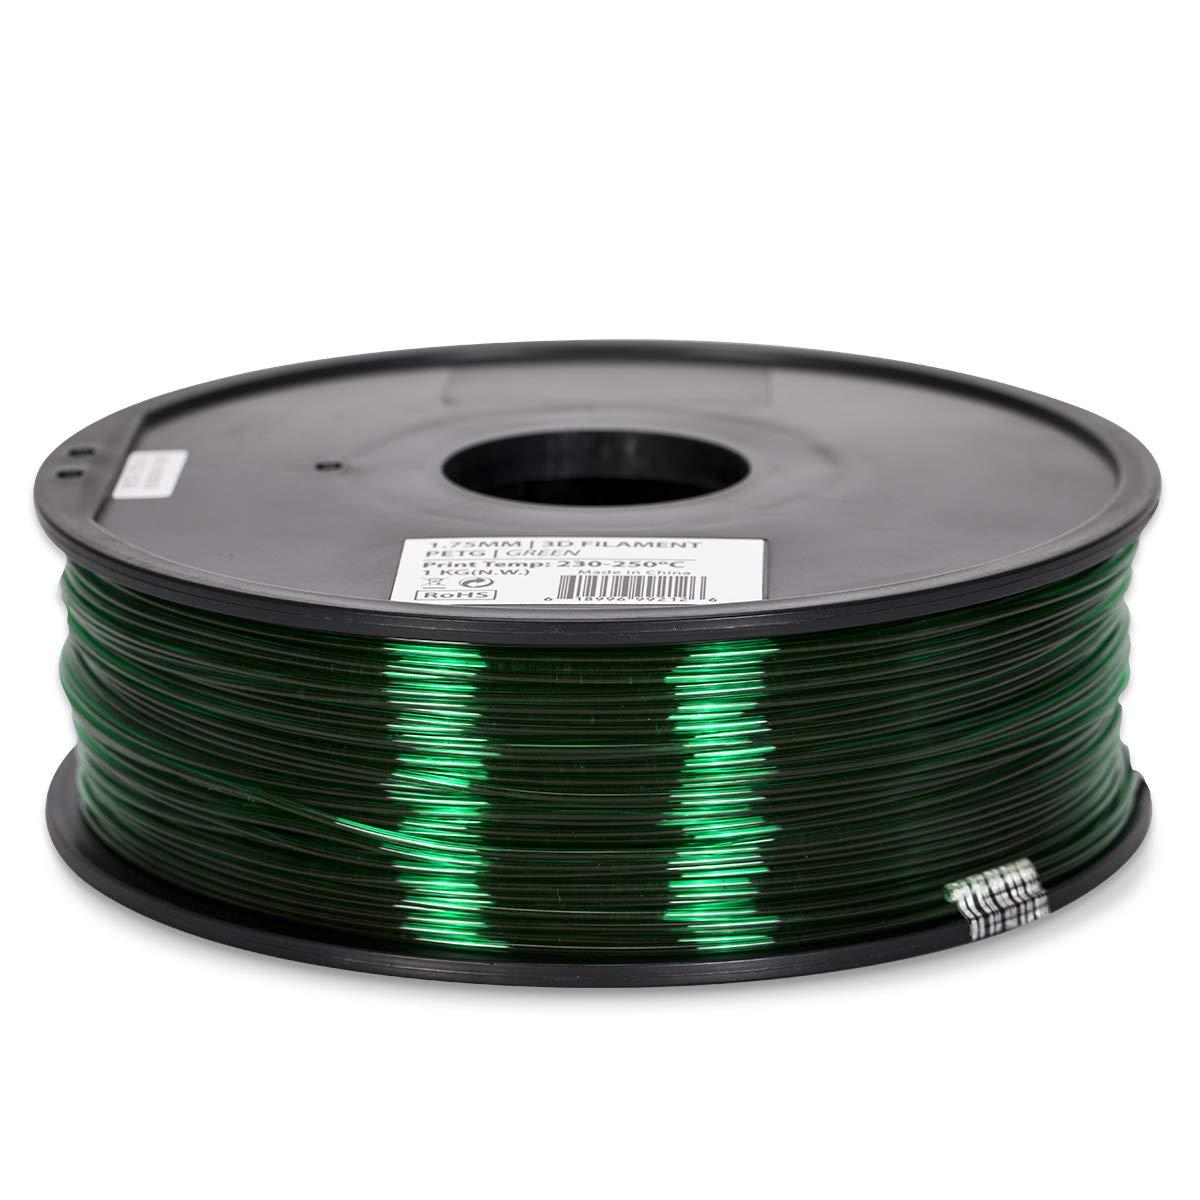 PETG Filament - 1.75 - Green Translucent - Inland